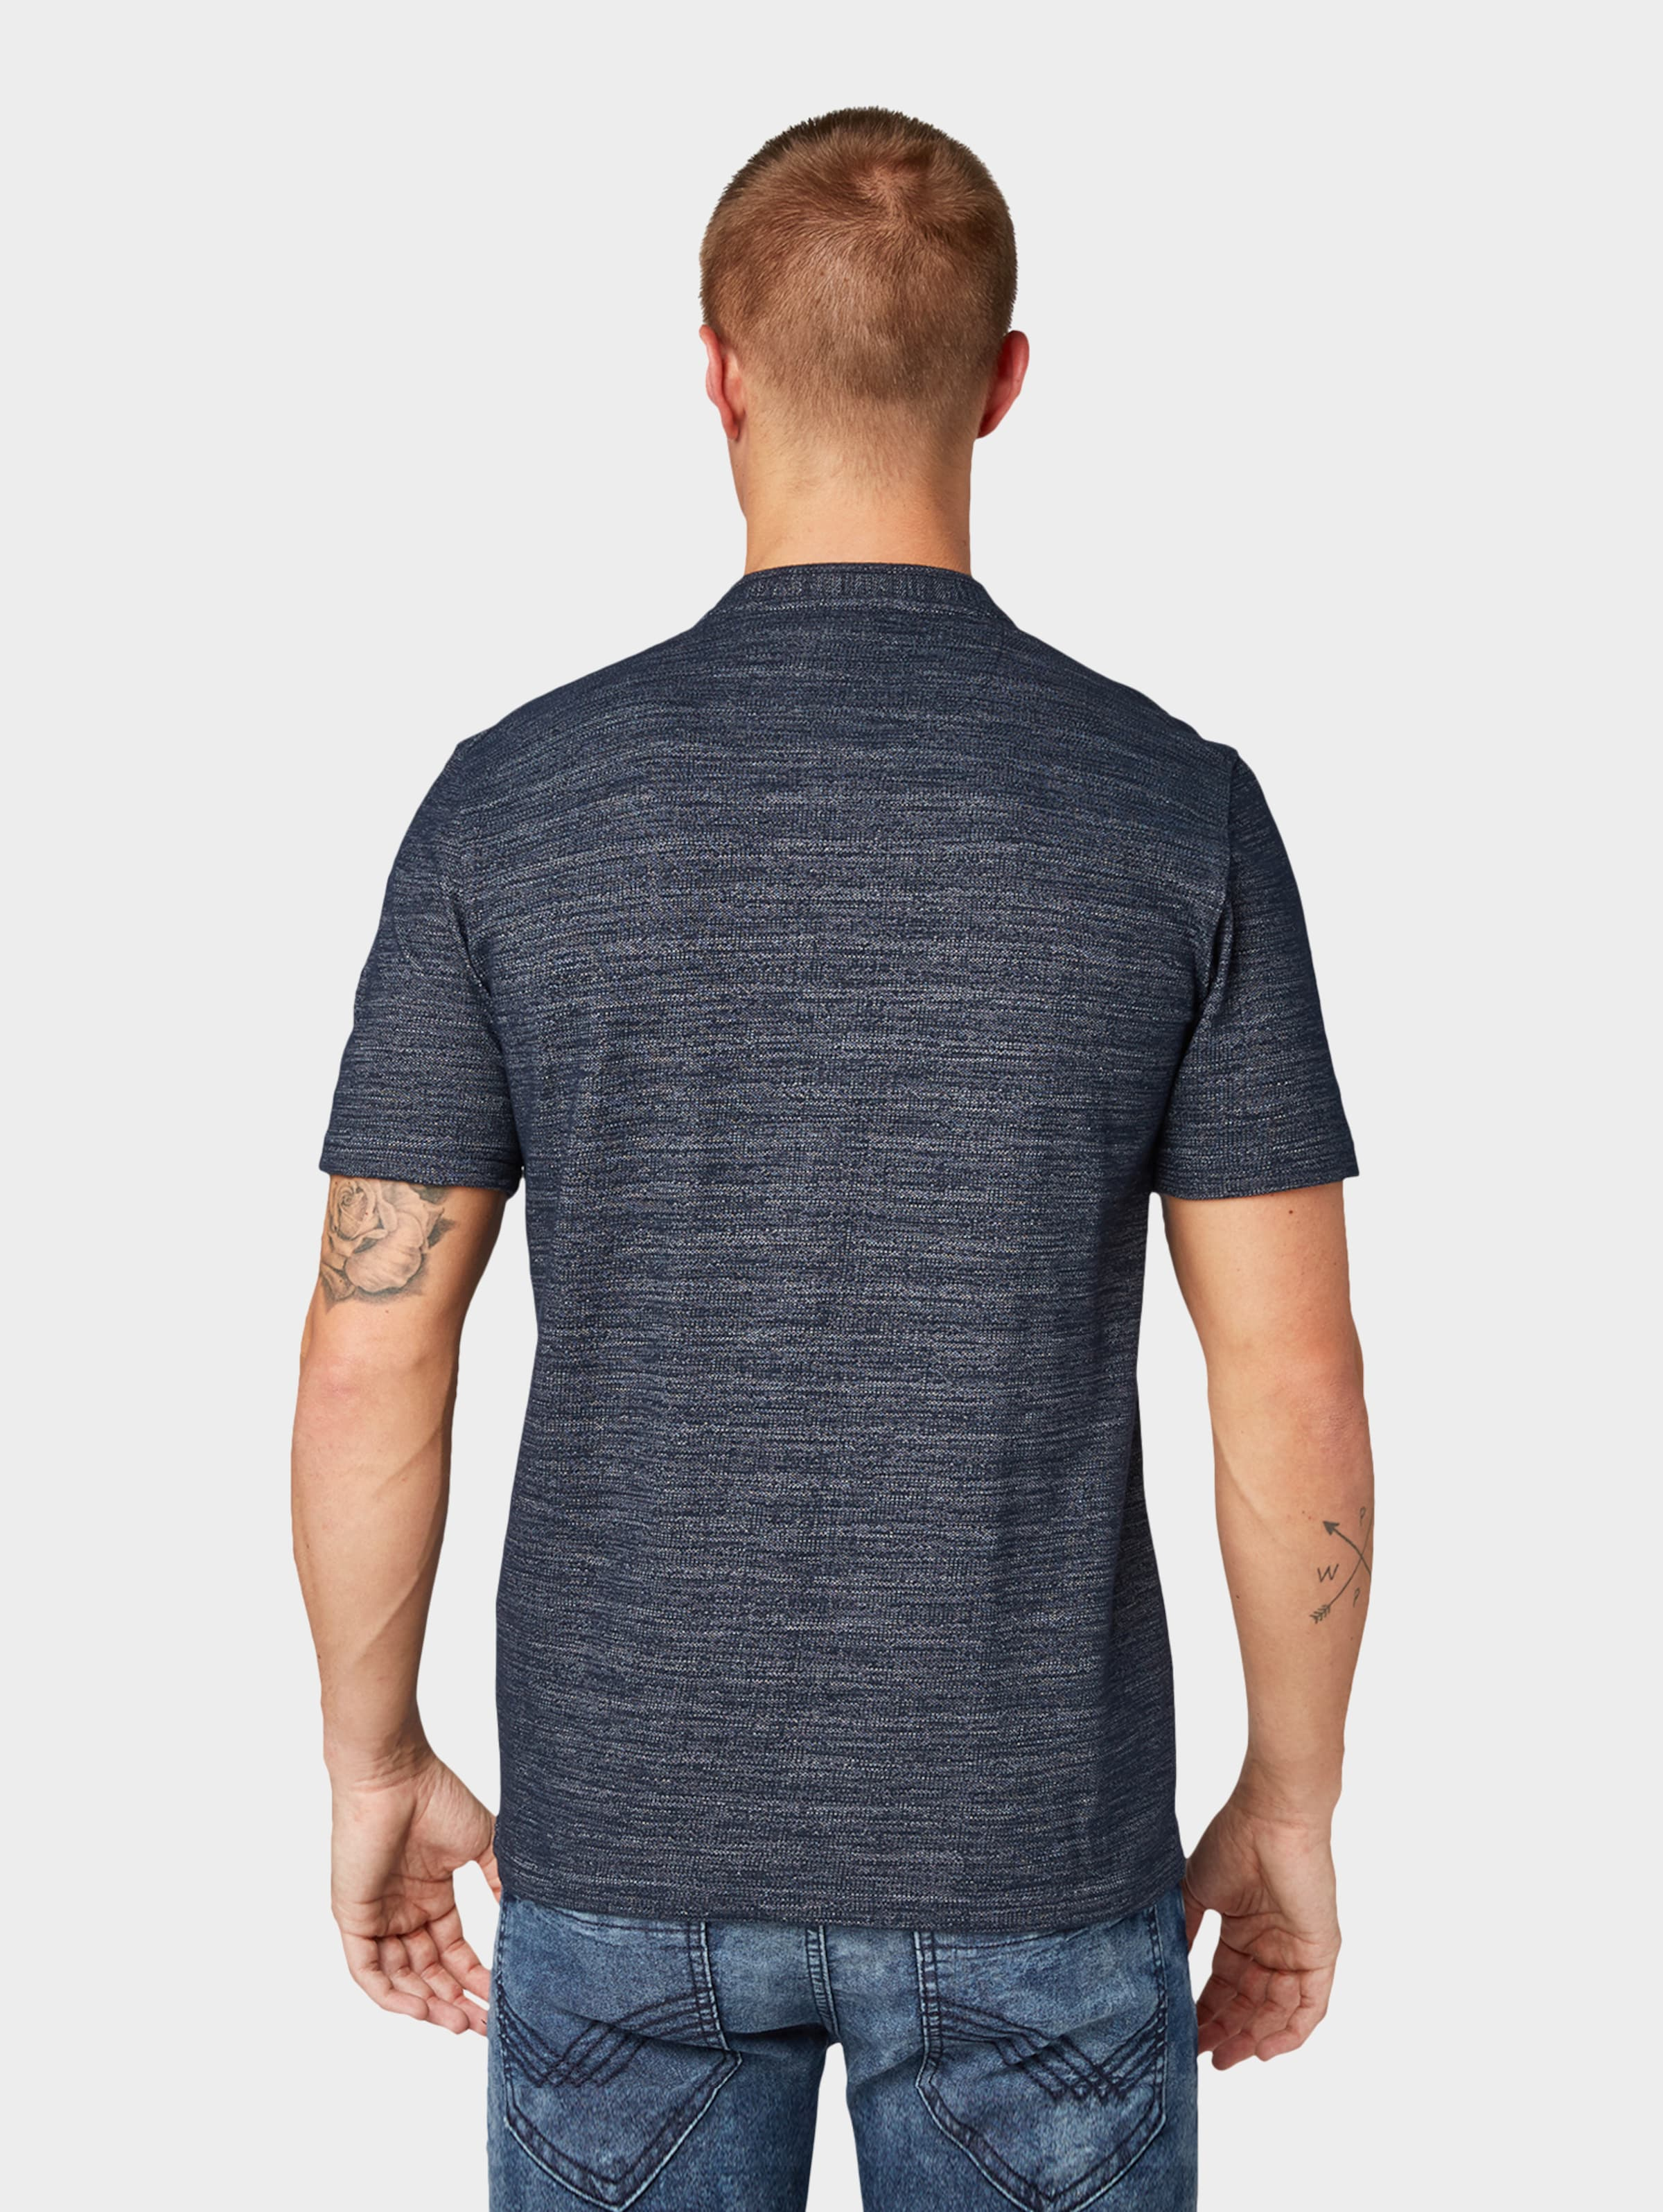 T Tailor In Dunkelblau Tom shirt Nm8wn0vO